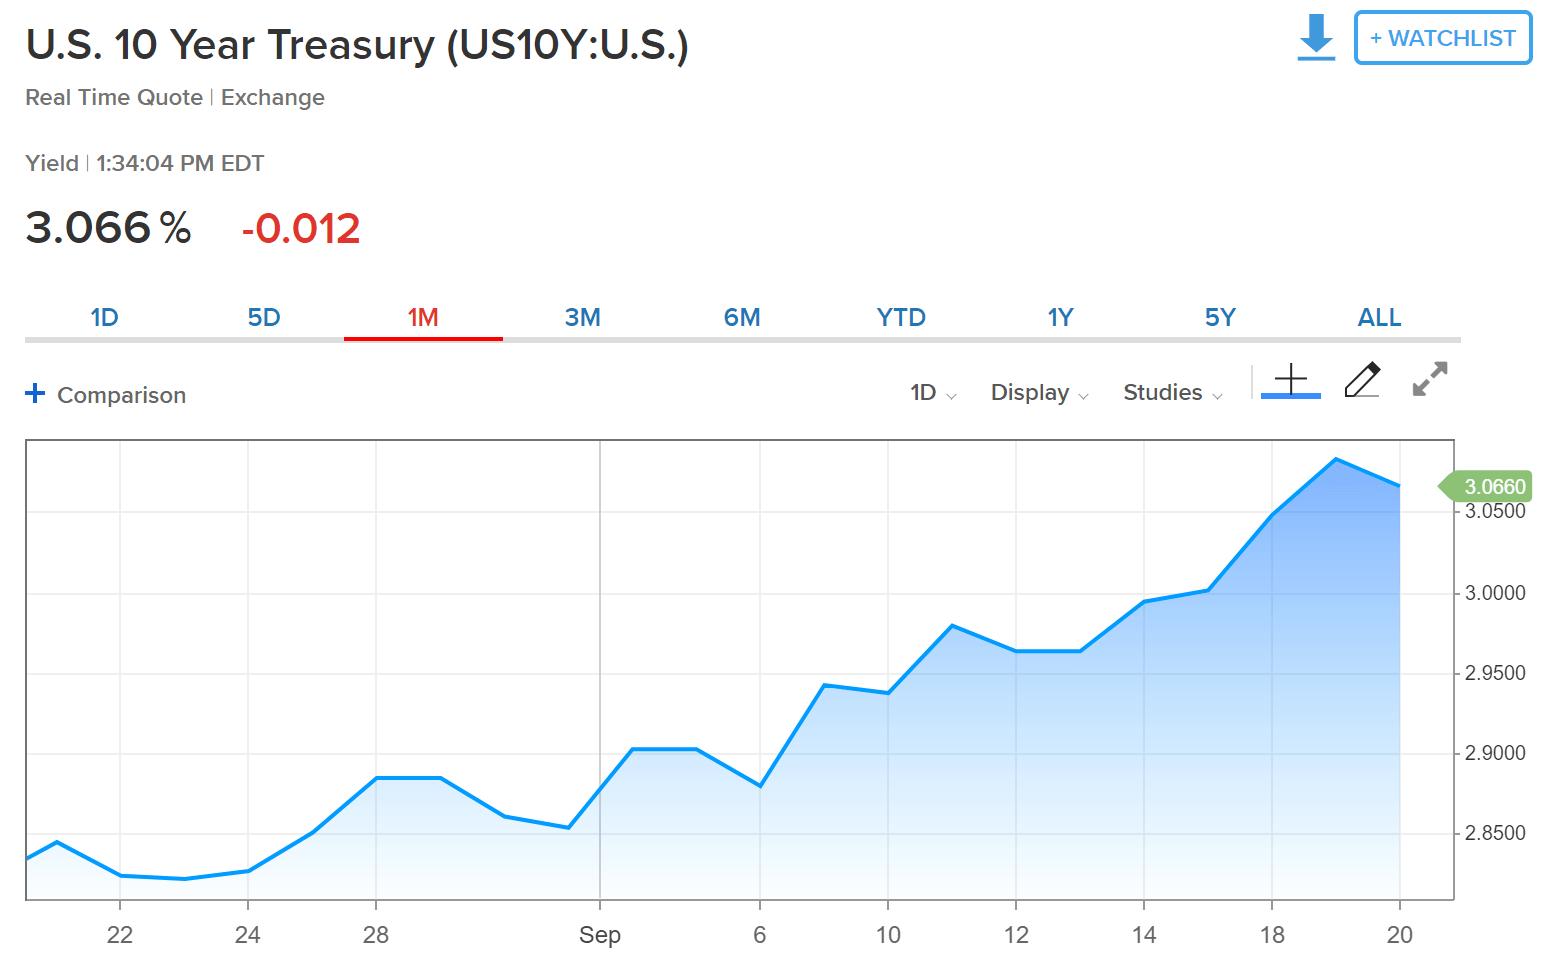 one month line chart of rising U.S. 10-year treasury yields